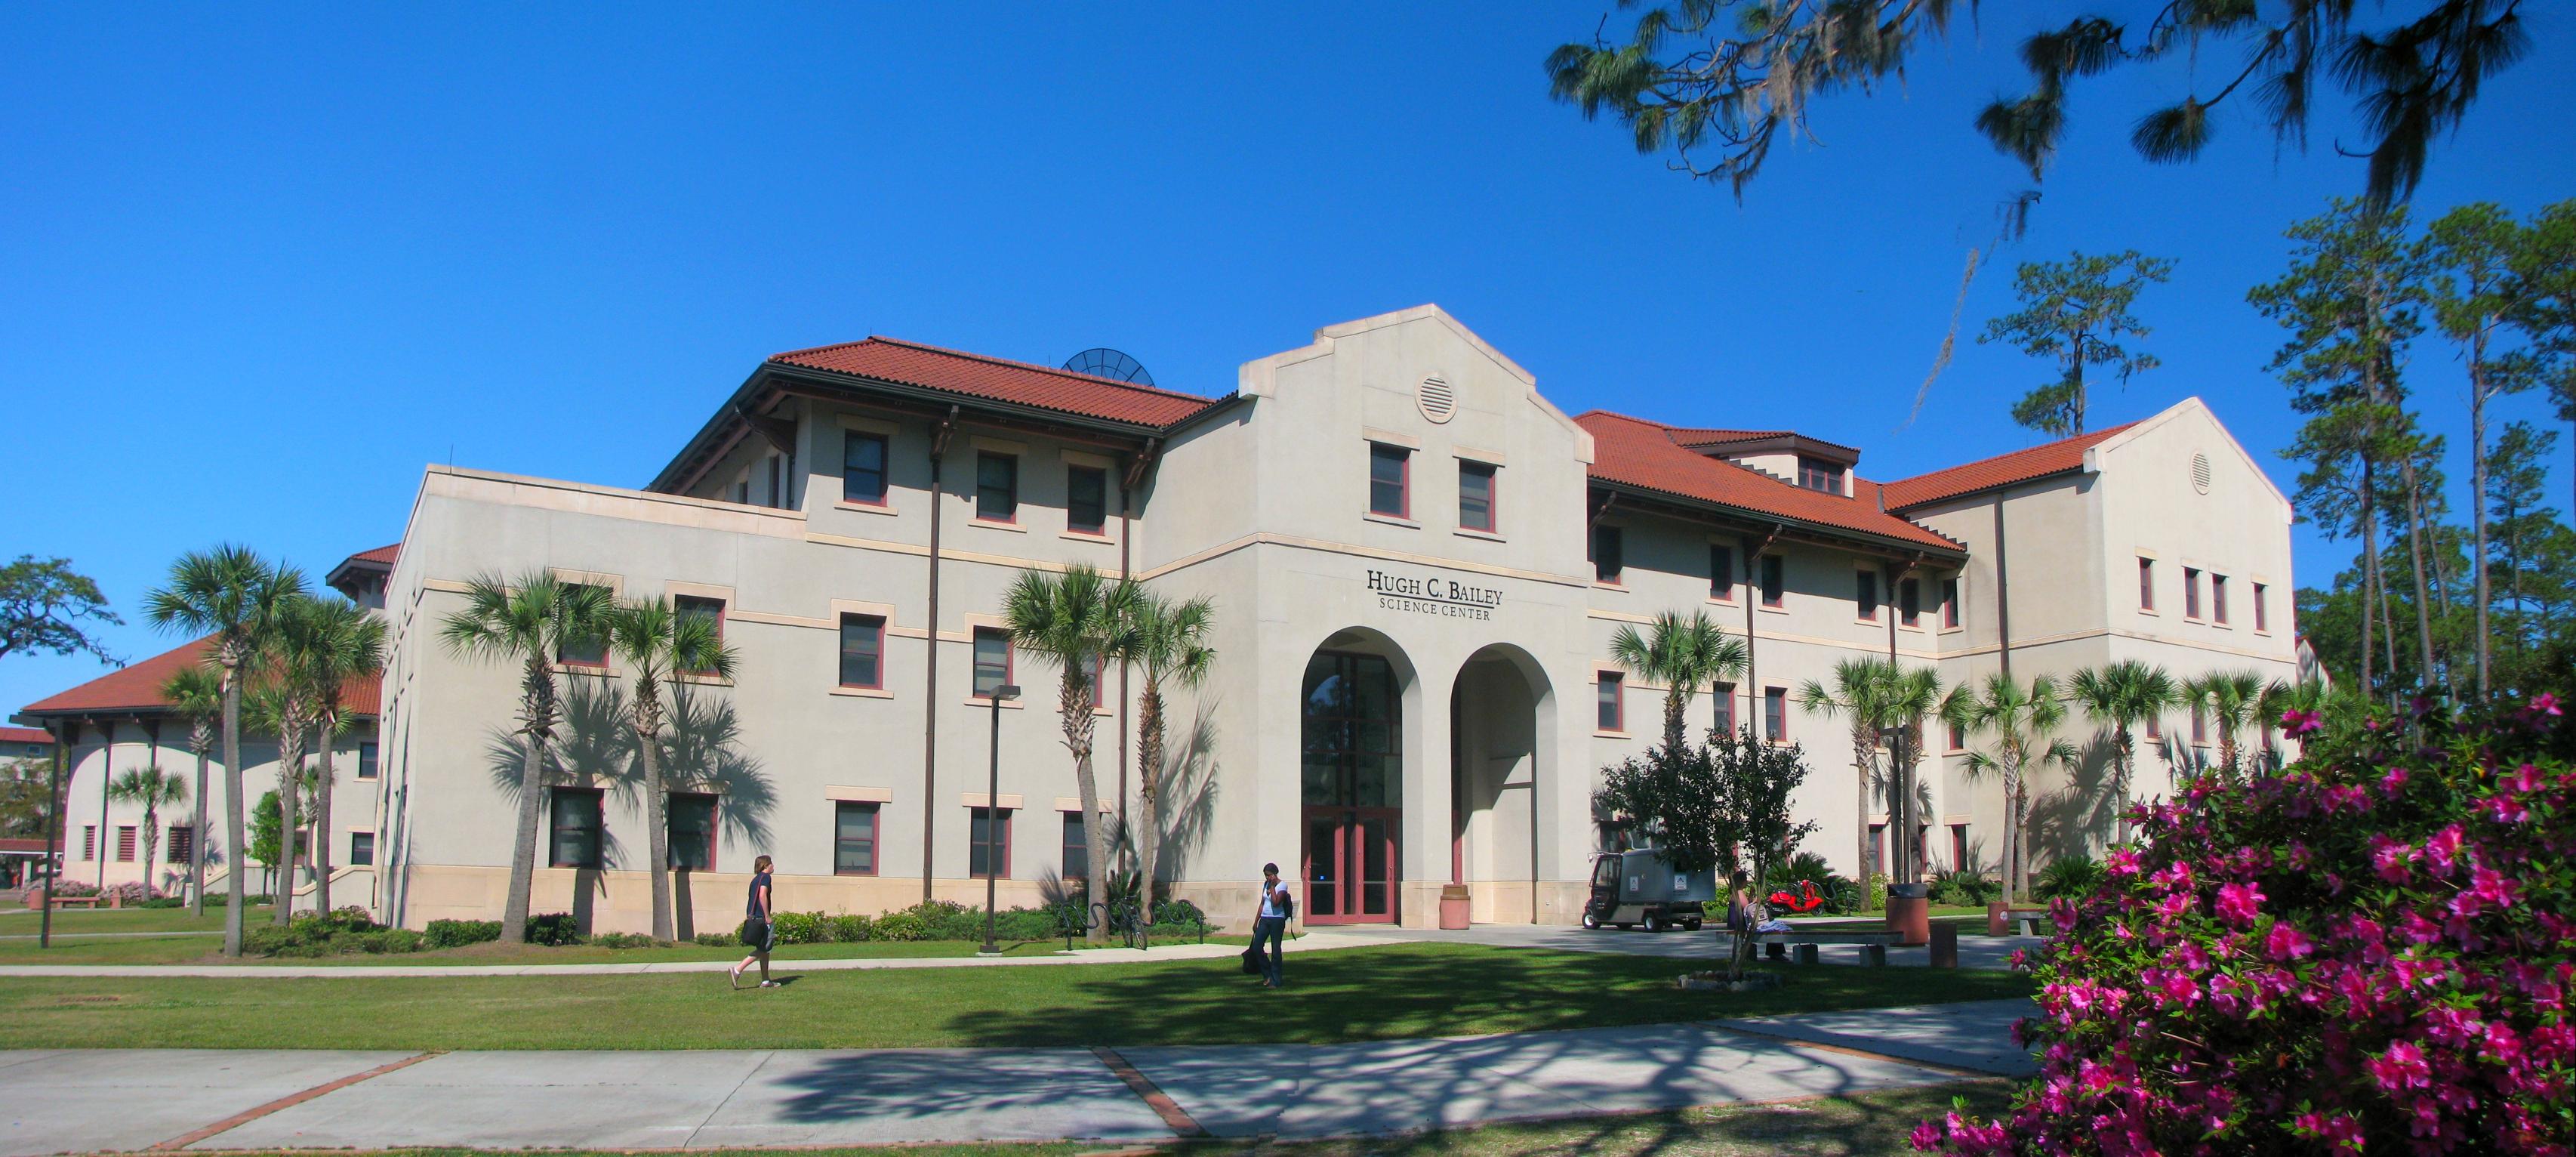 Hugh C. Bailey Science Center